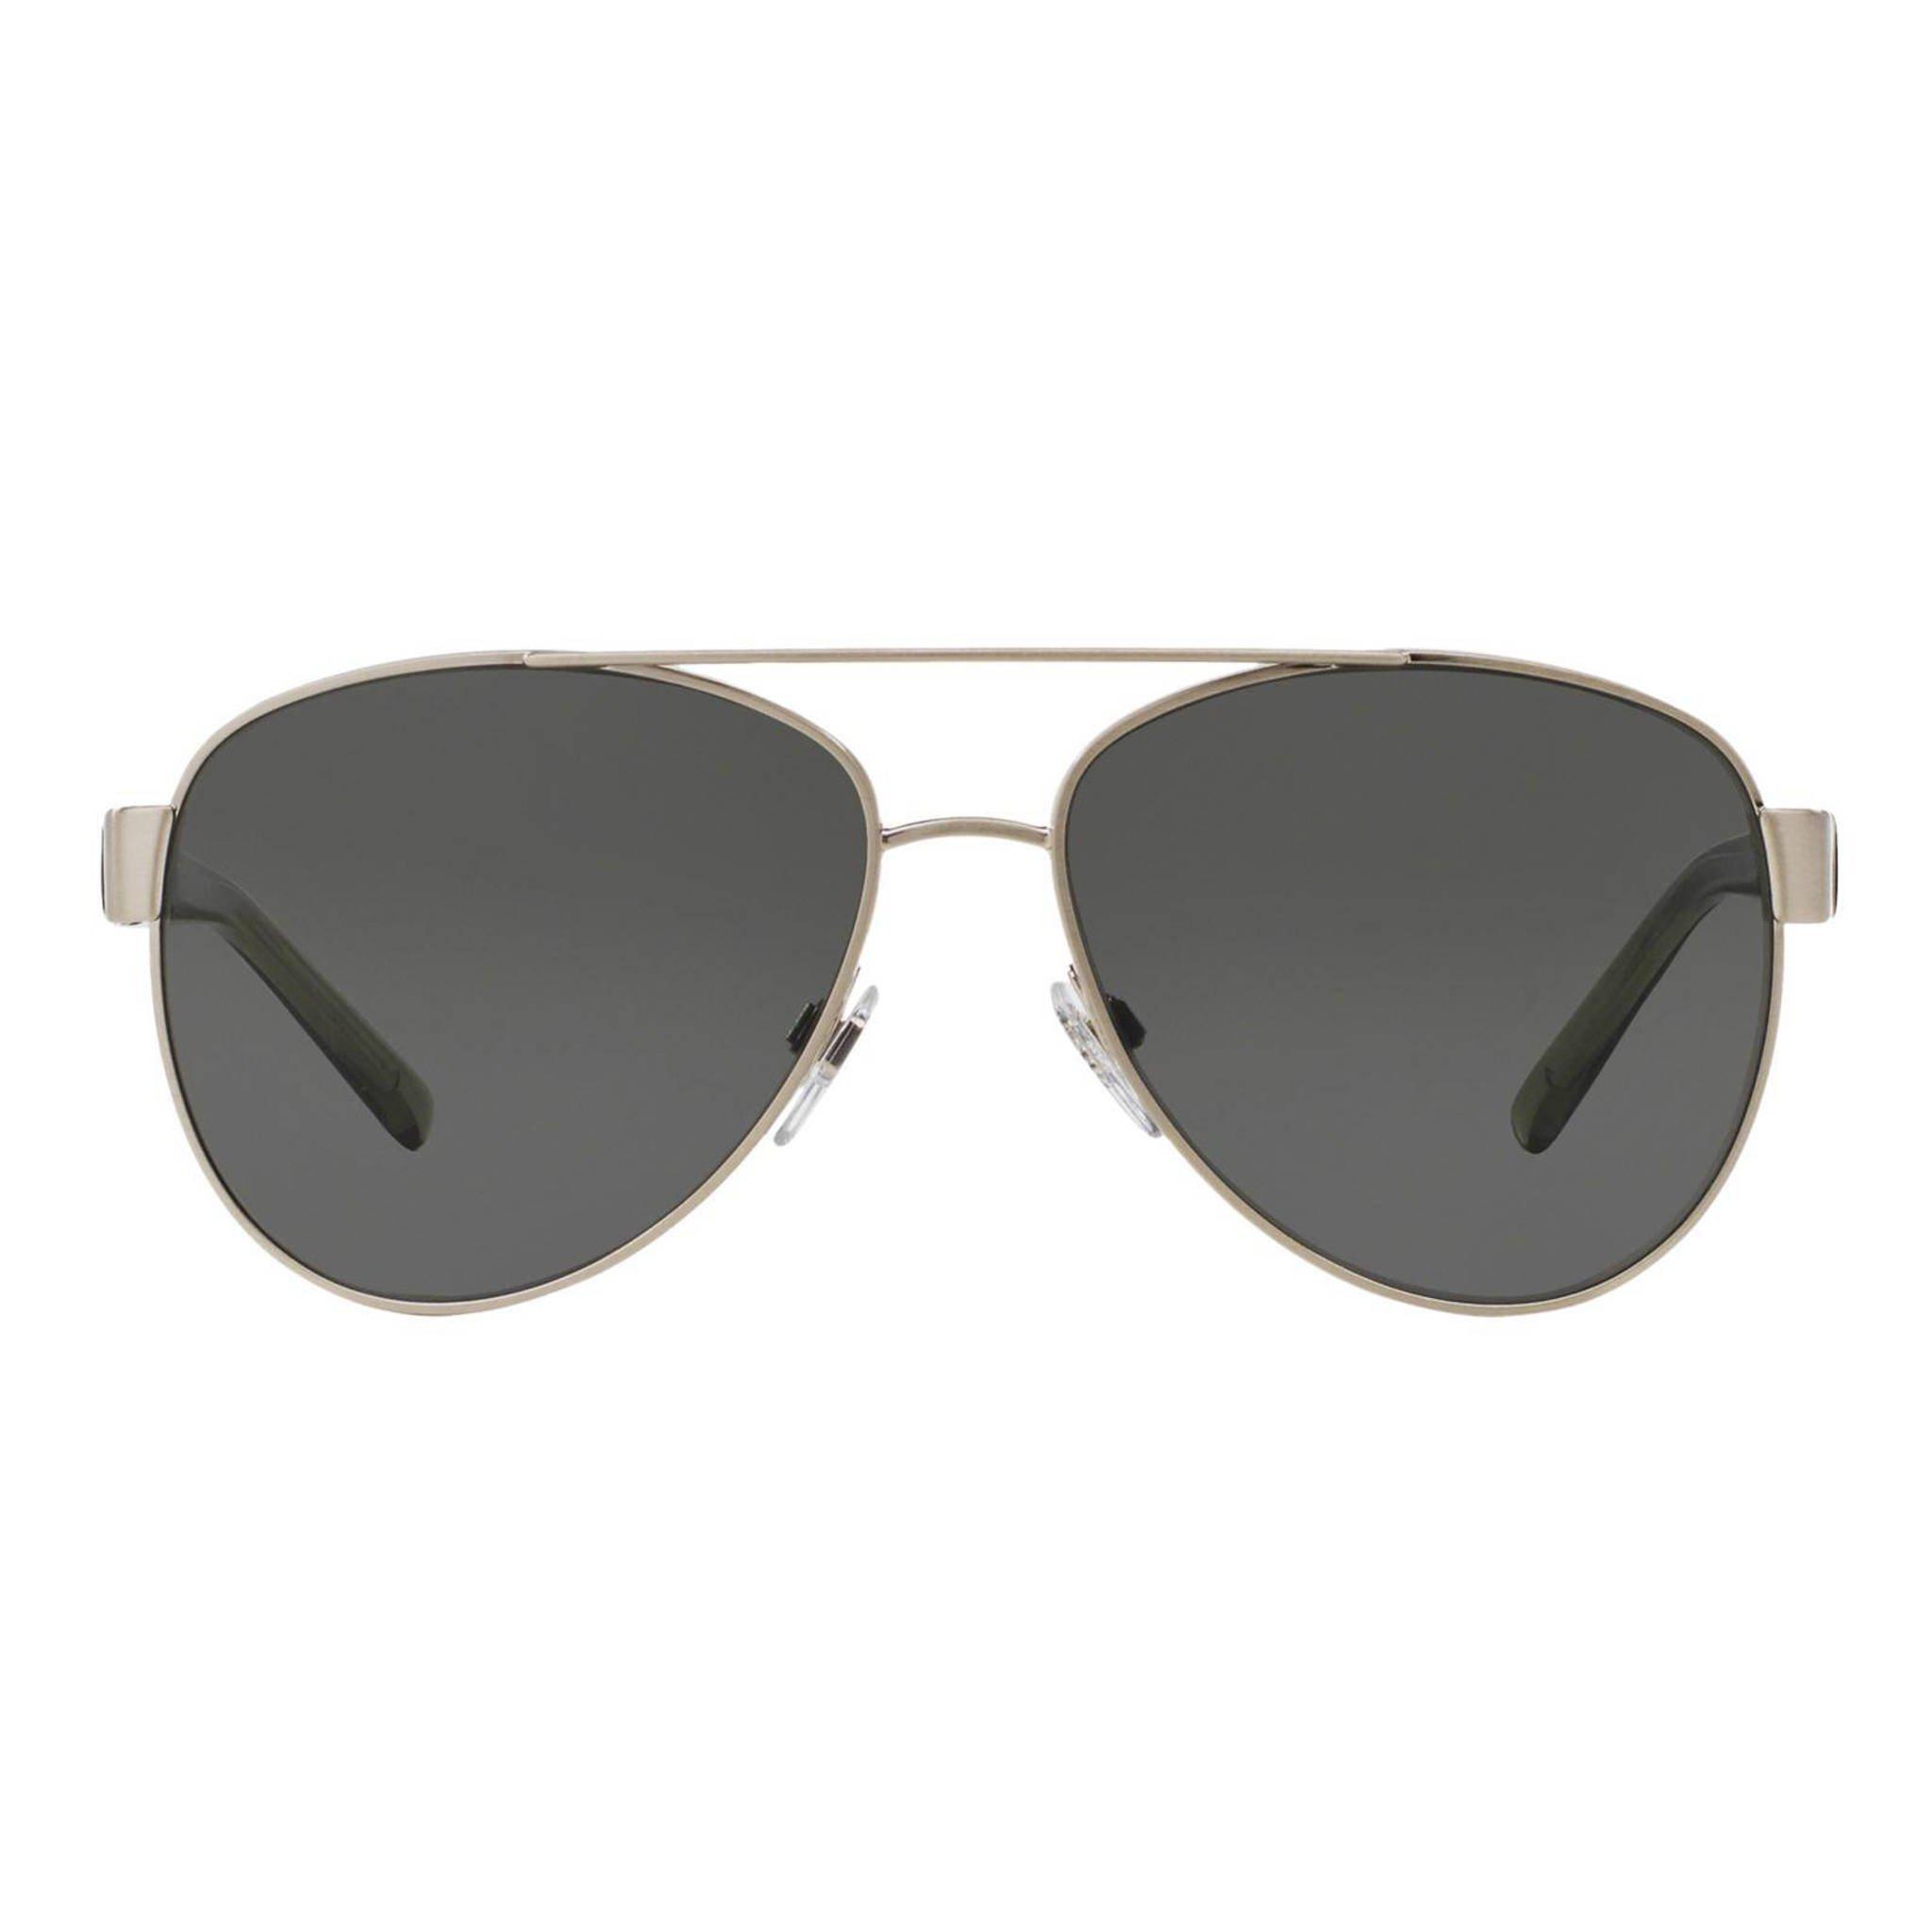 491f621611dbc0 Burberry zonnebril